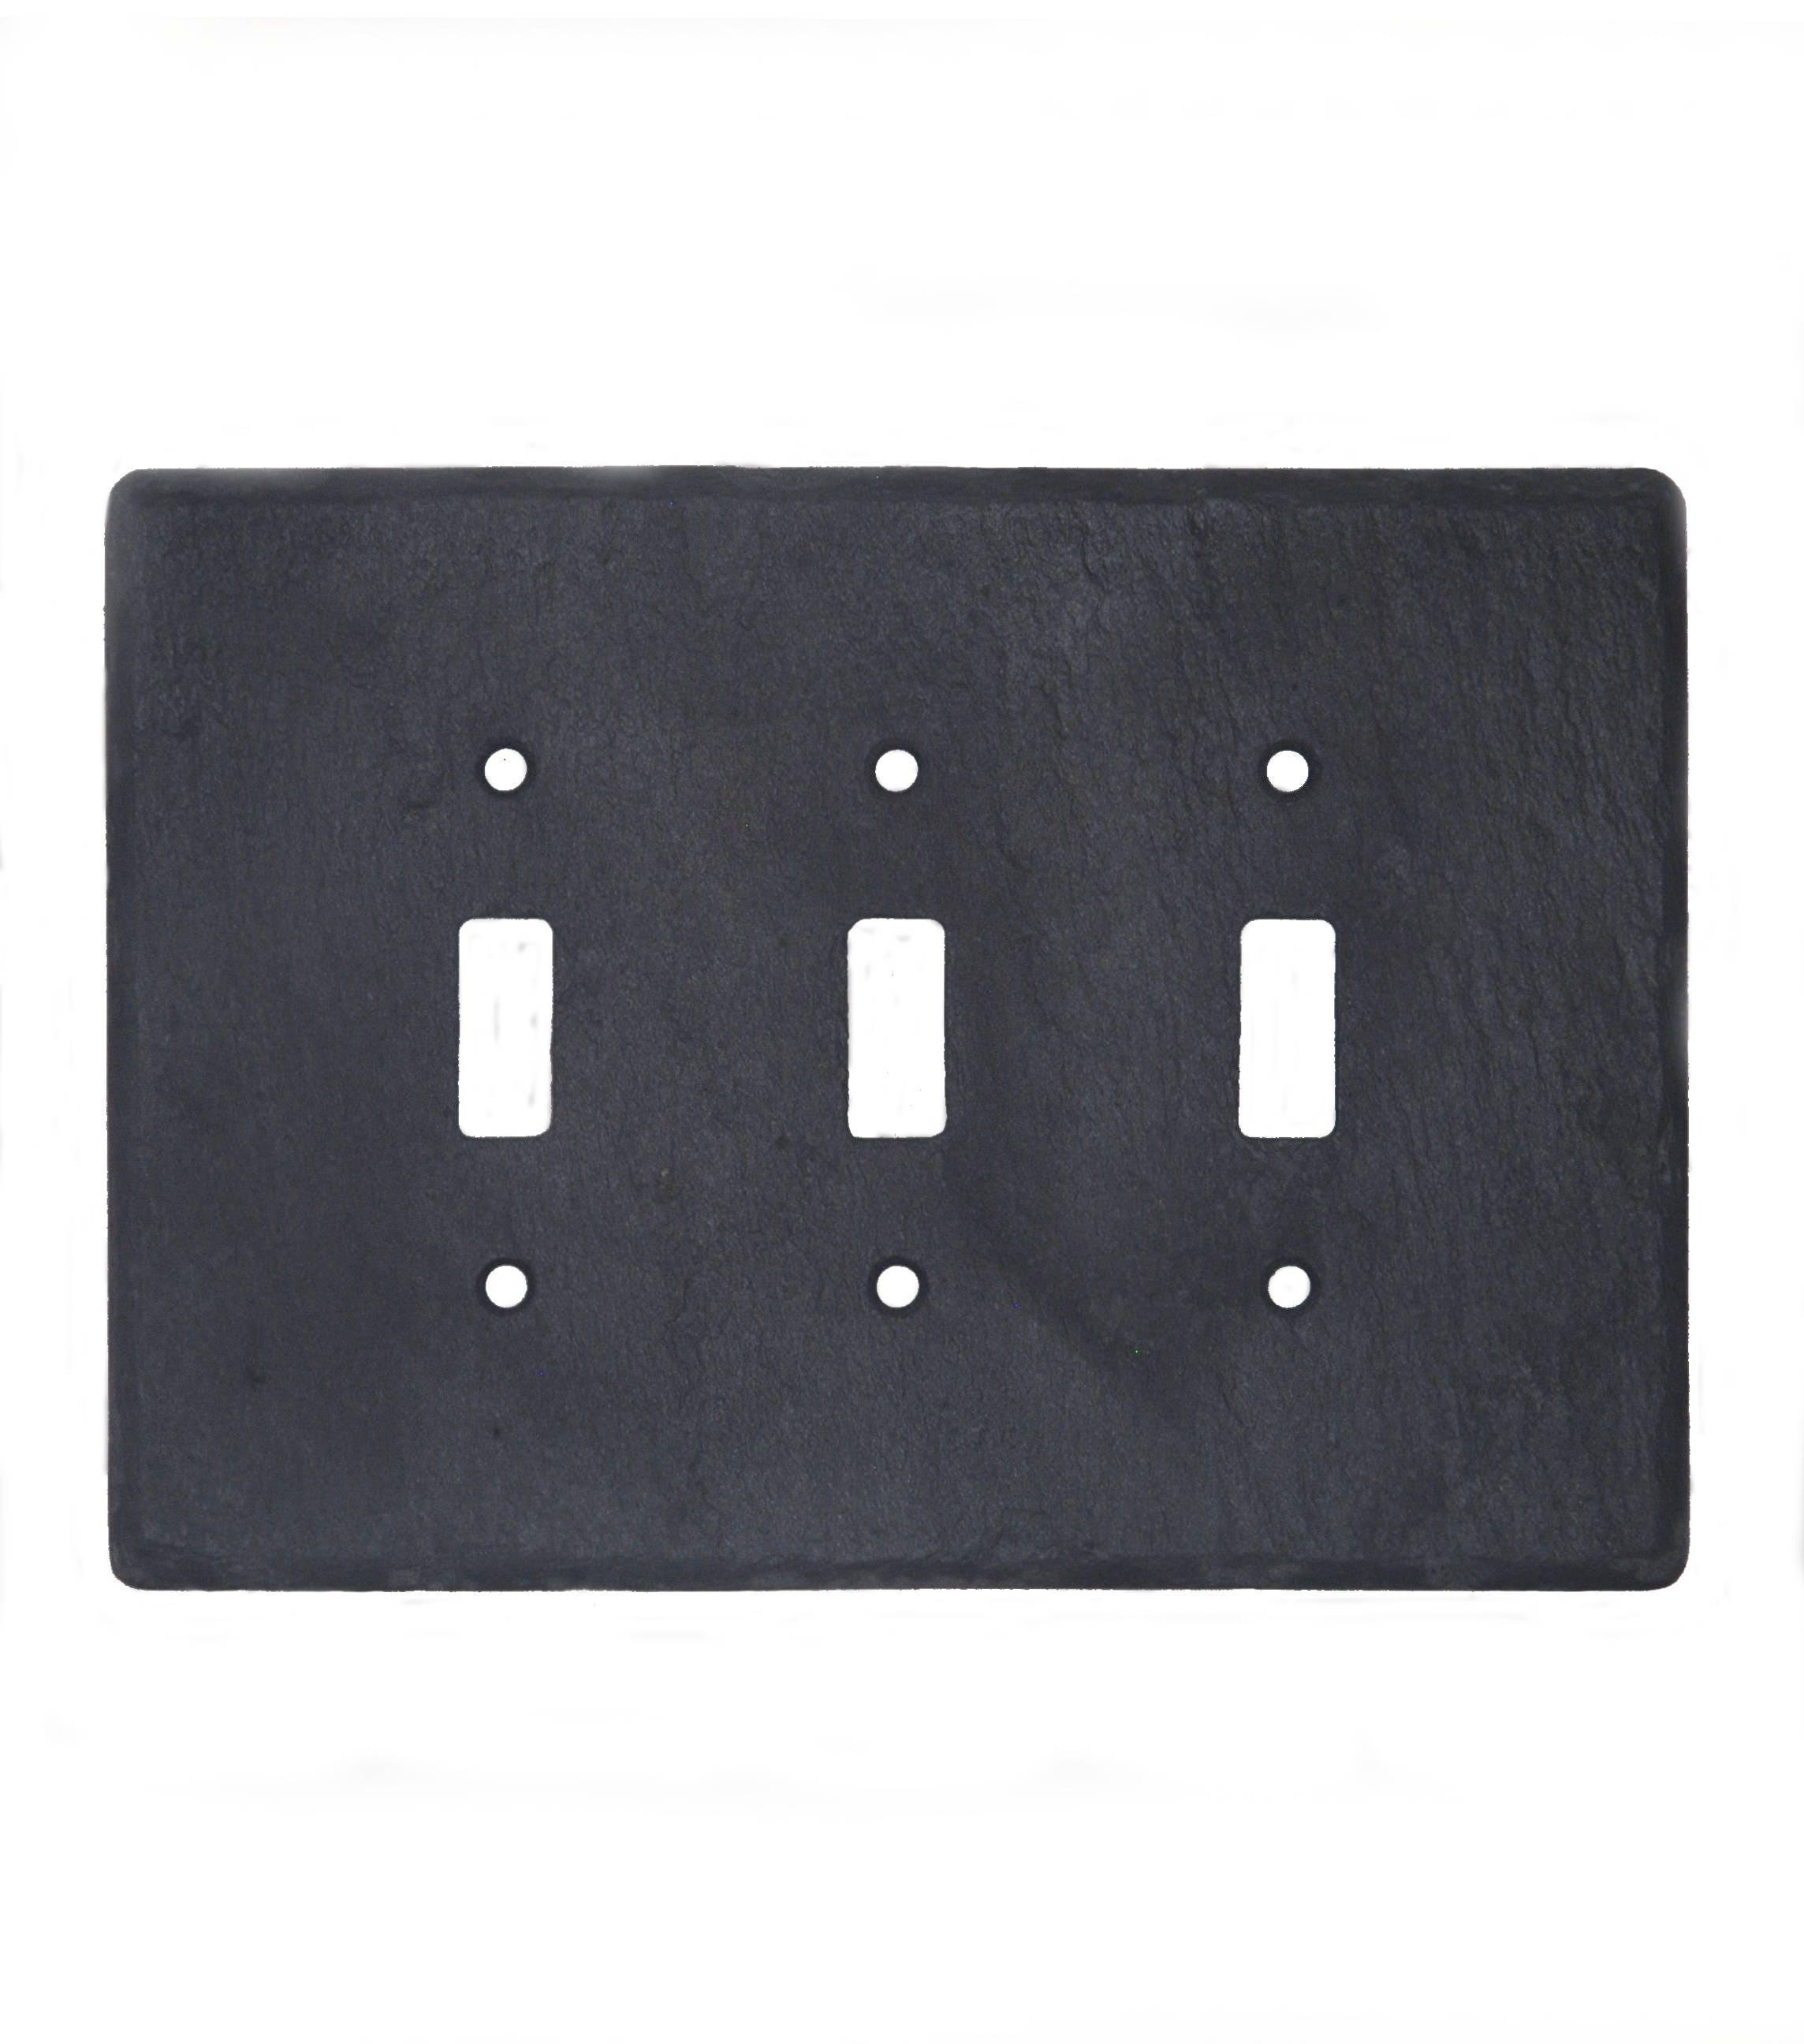 3 Switch Light Plate Best Decorative Triple Light Switch Cover 3 Switch Plate Wall Decorating Design